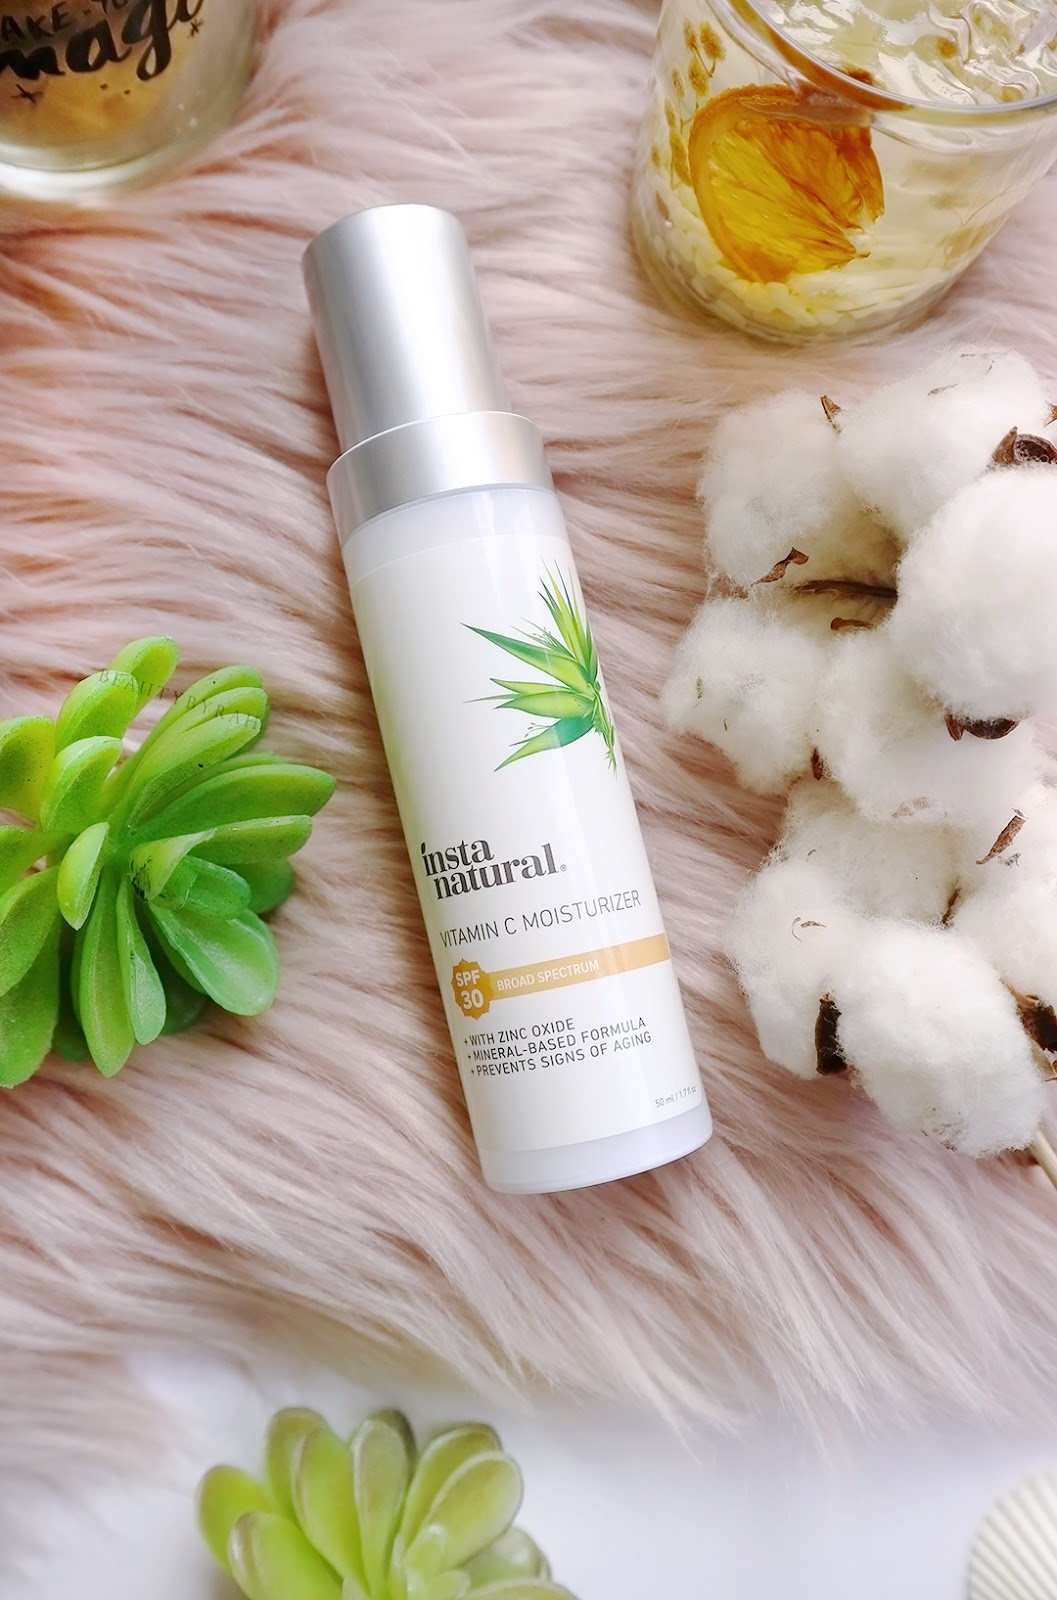 InstaNatural Vitamin C moisturiser review